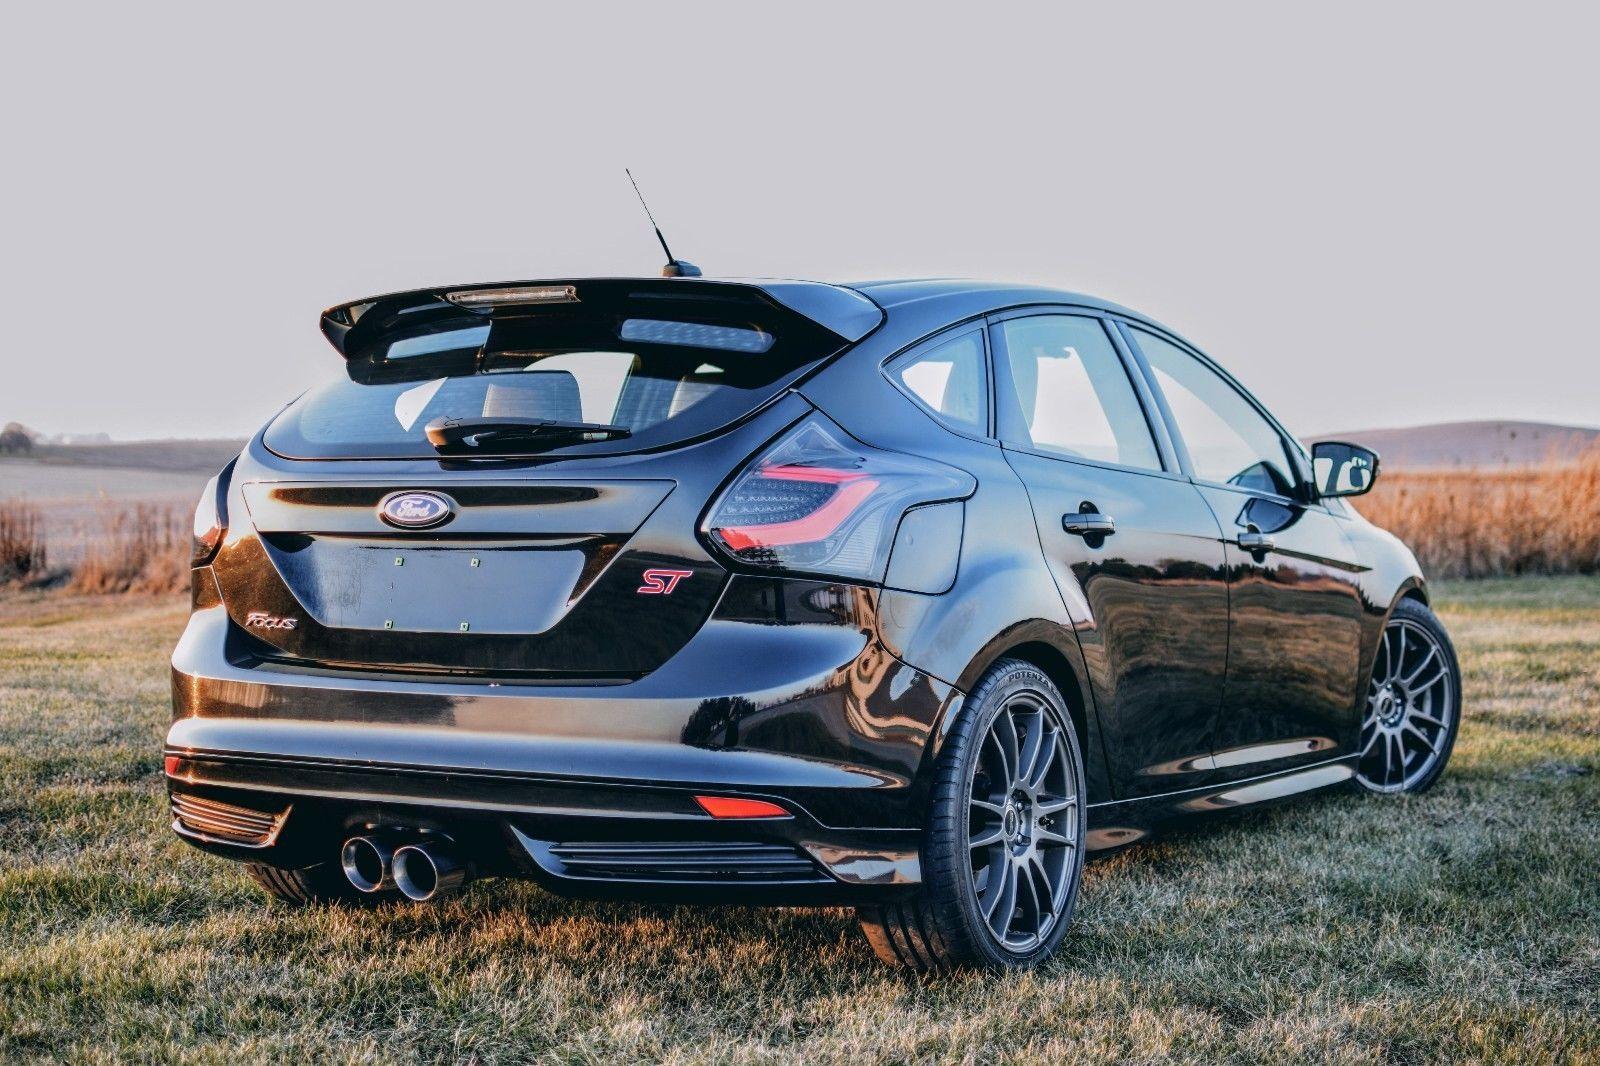 Amazing 2017 Ford Focus St Hatchback 4 Door St3 Spec Turbo 400 Whp 12k In Upgrades Recaro Navi 2018